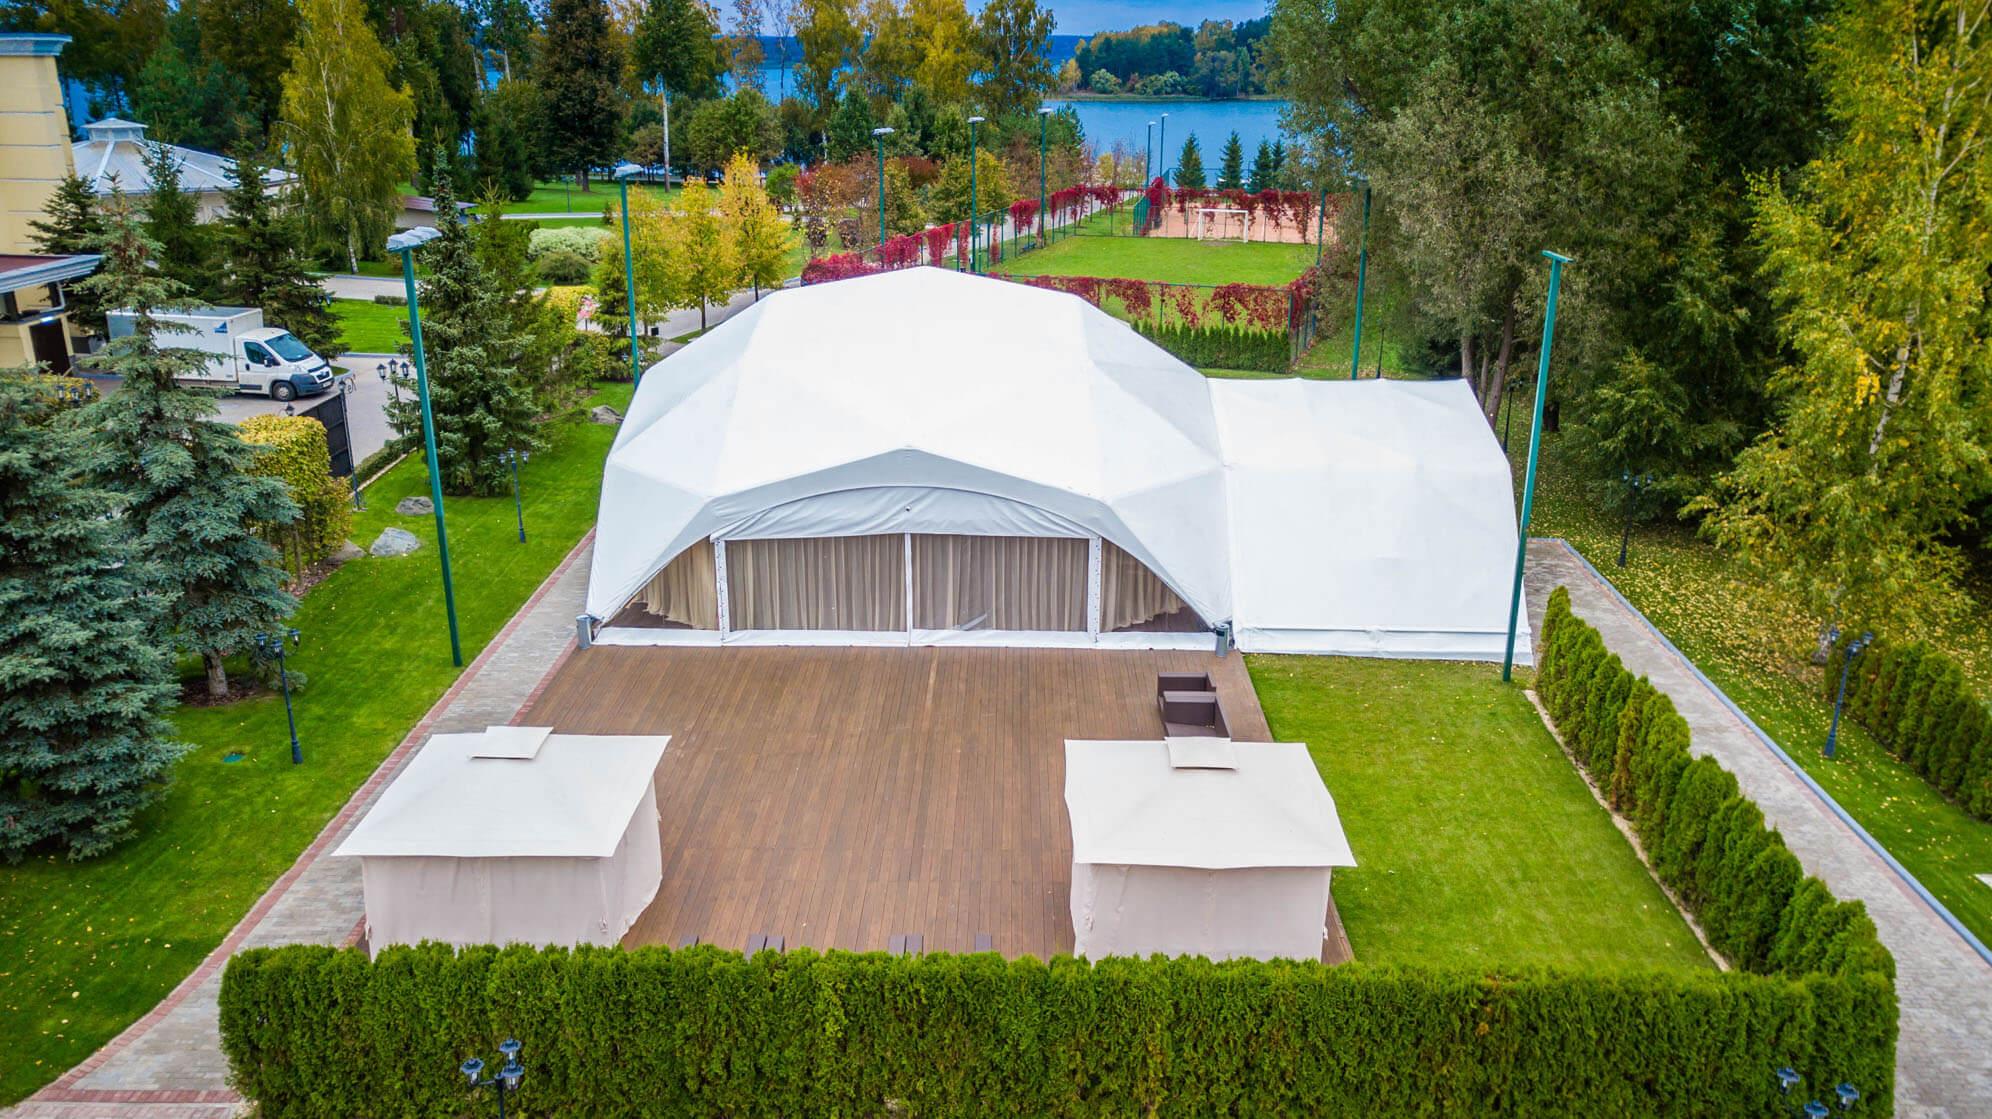 Свадебный шатер: плюсы и минусы